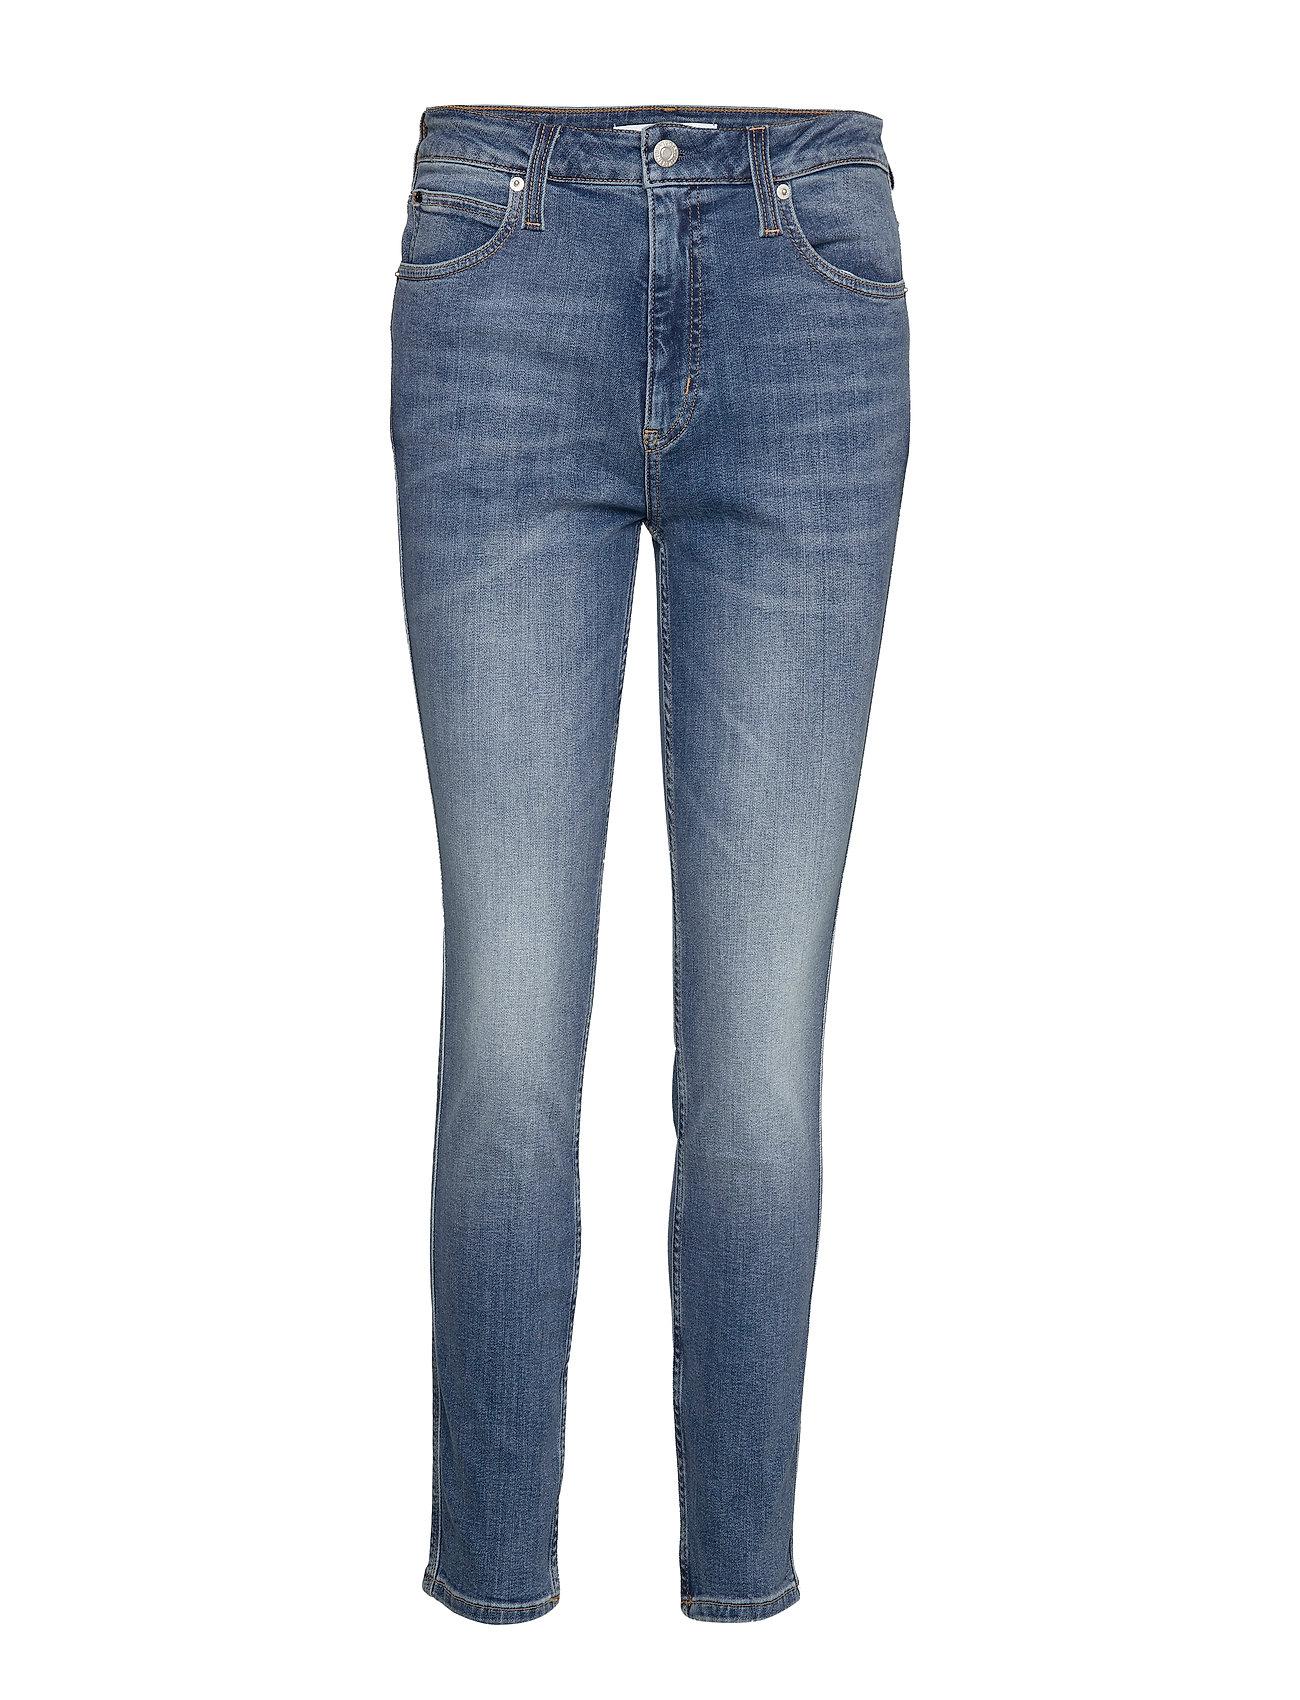 Calvin Klein Jeans CKJ 010 HIGH RISE SKINNY - BA142 LIGHT BLUE TRIPLE NEEDLE